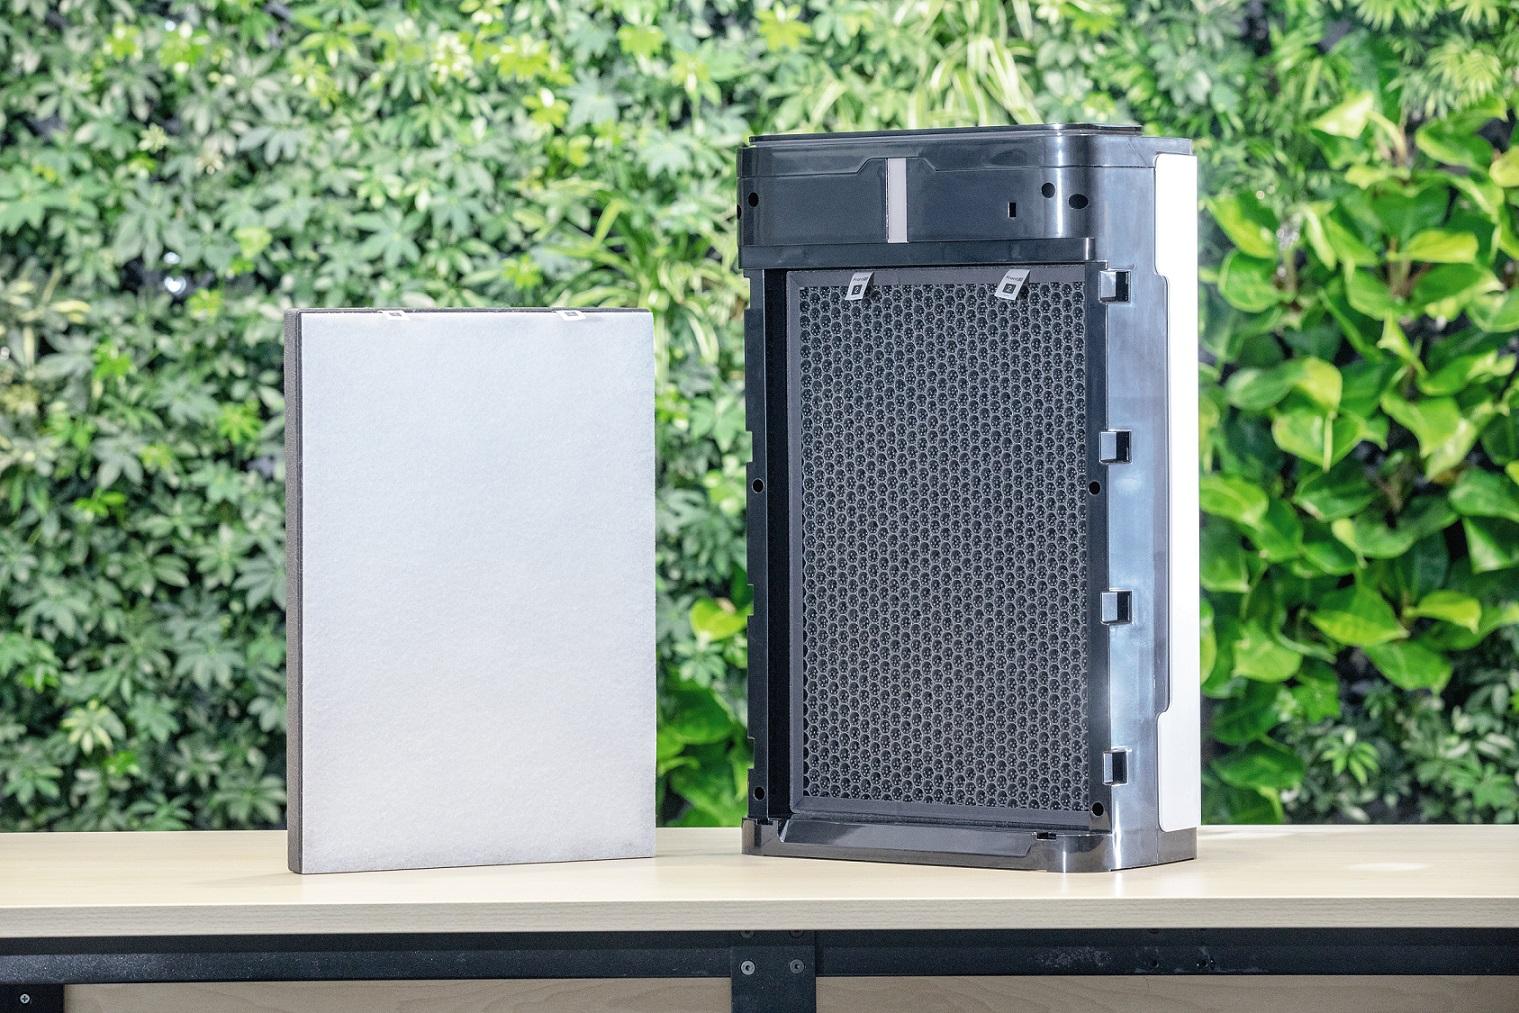 Aurabeat AG+TM銀離子消毒空氣淨化機 Aurabeat AG+™ Silver Ion Plasma Sterilisation Air Purifier (2)